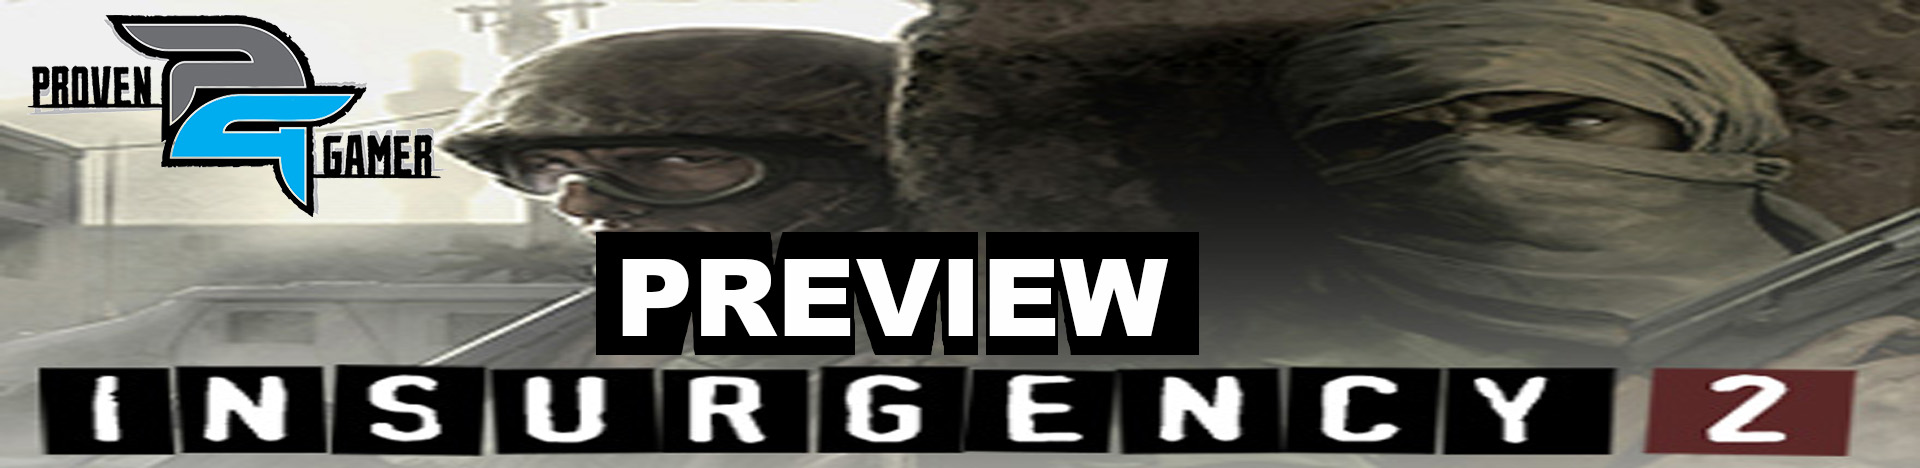 insurgency2